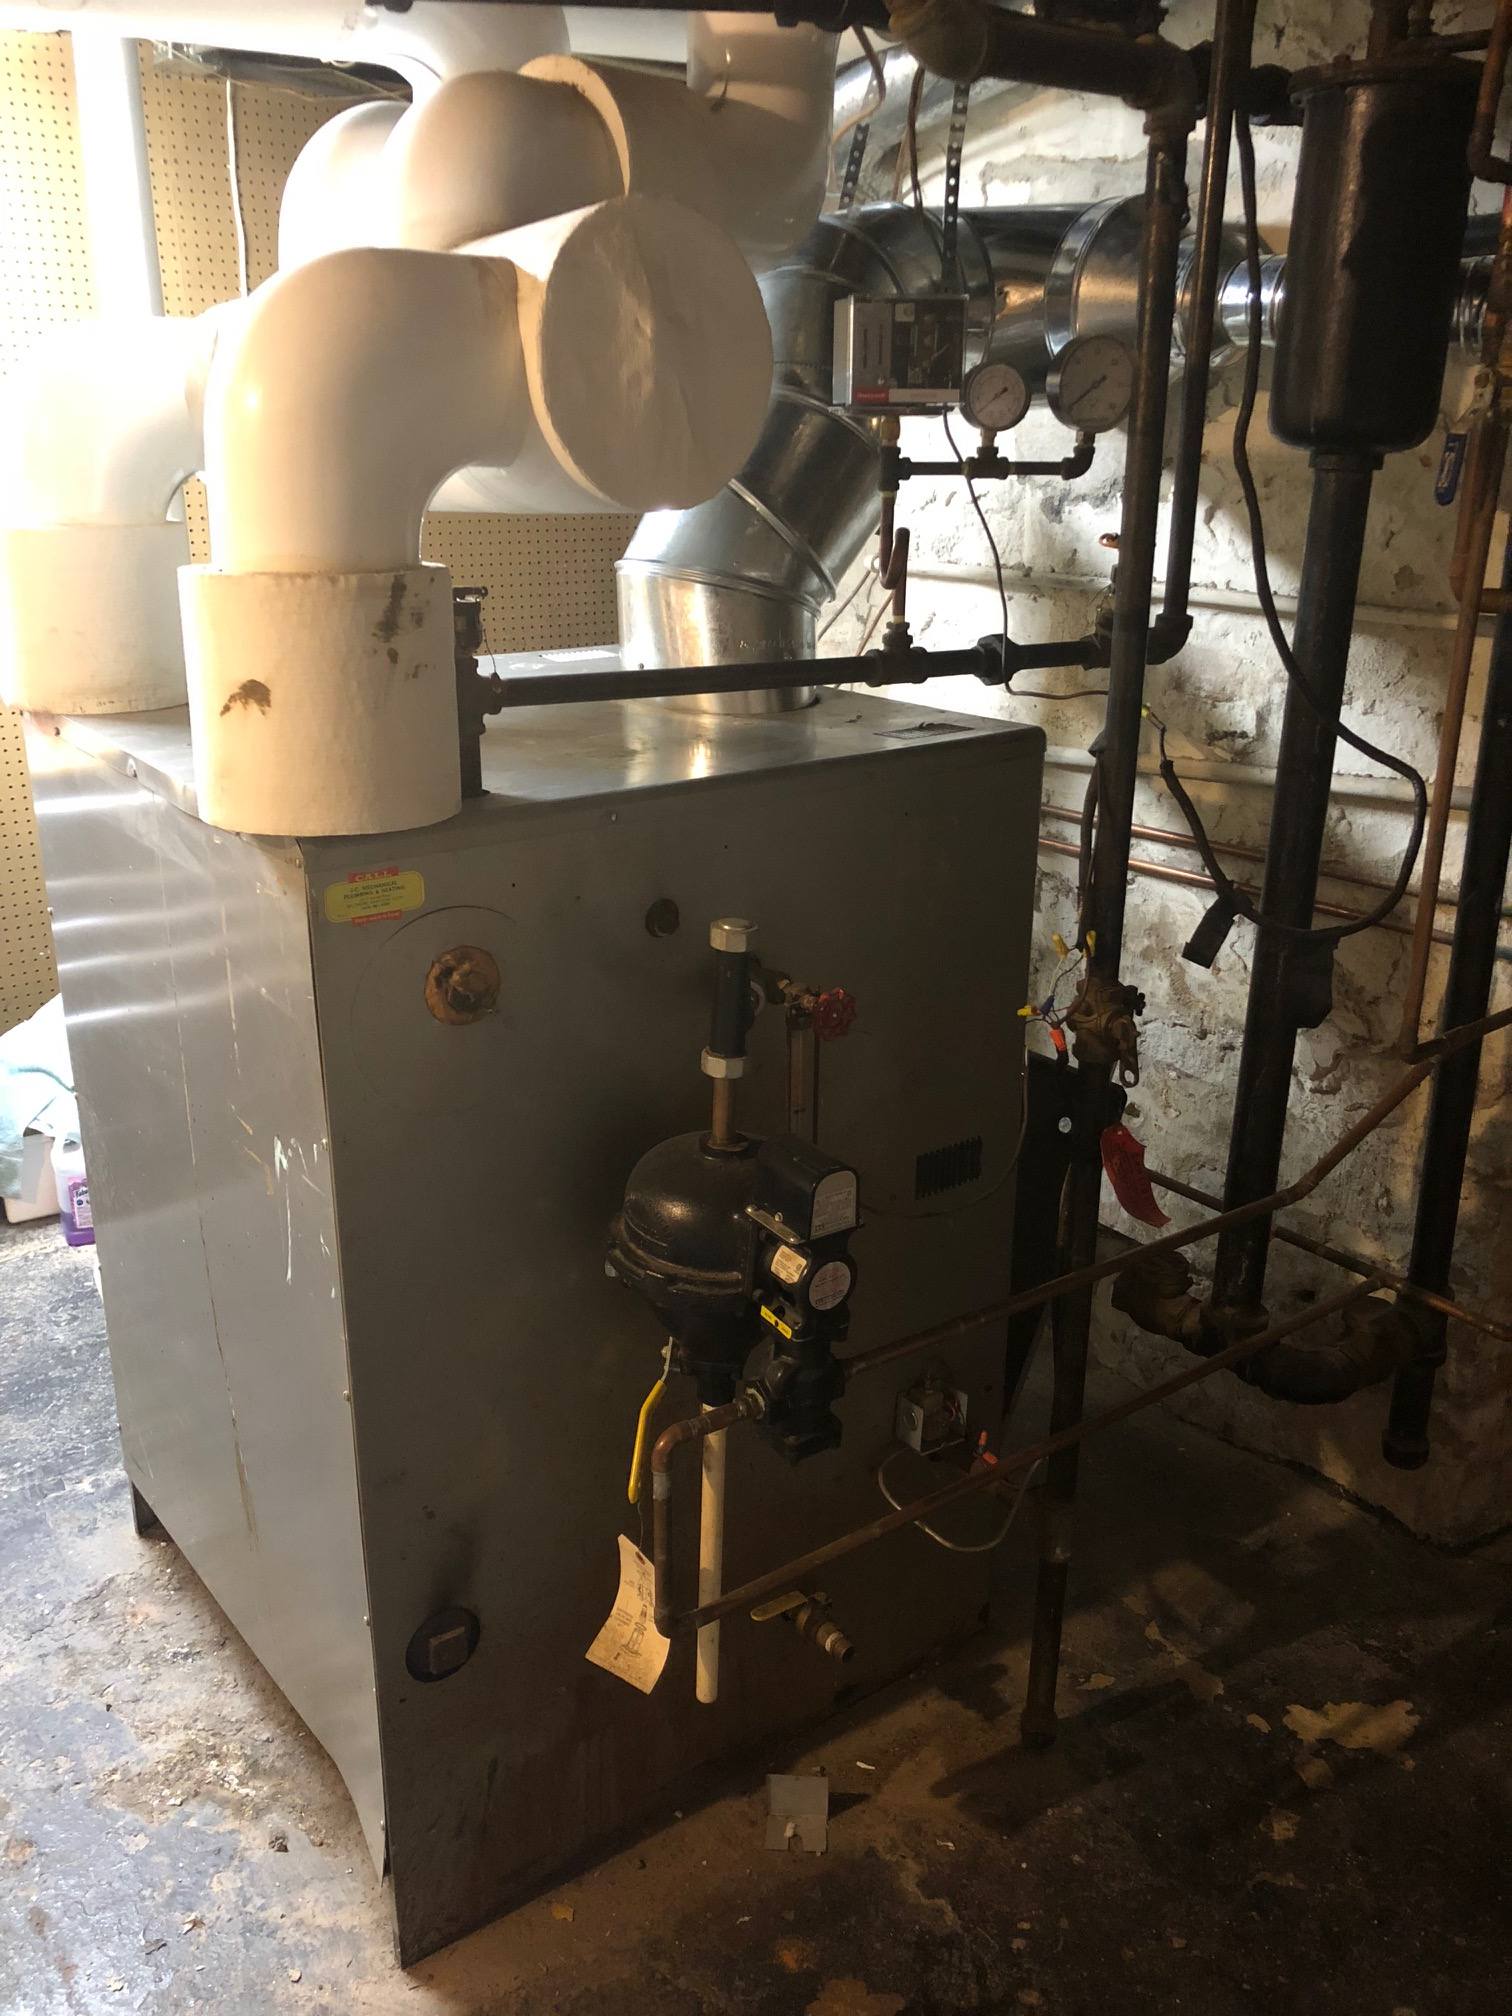 Need Operating Manual For American Standard Gas Boiler